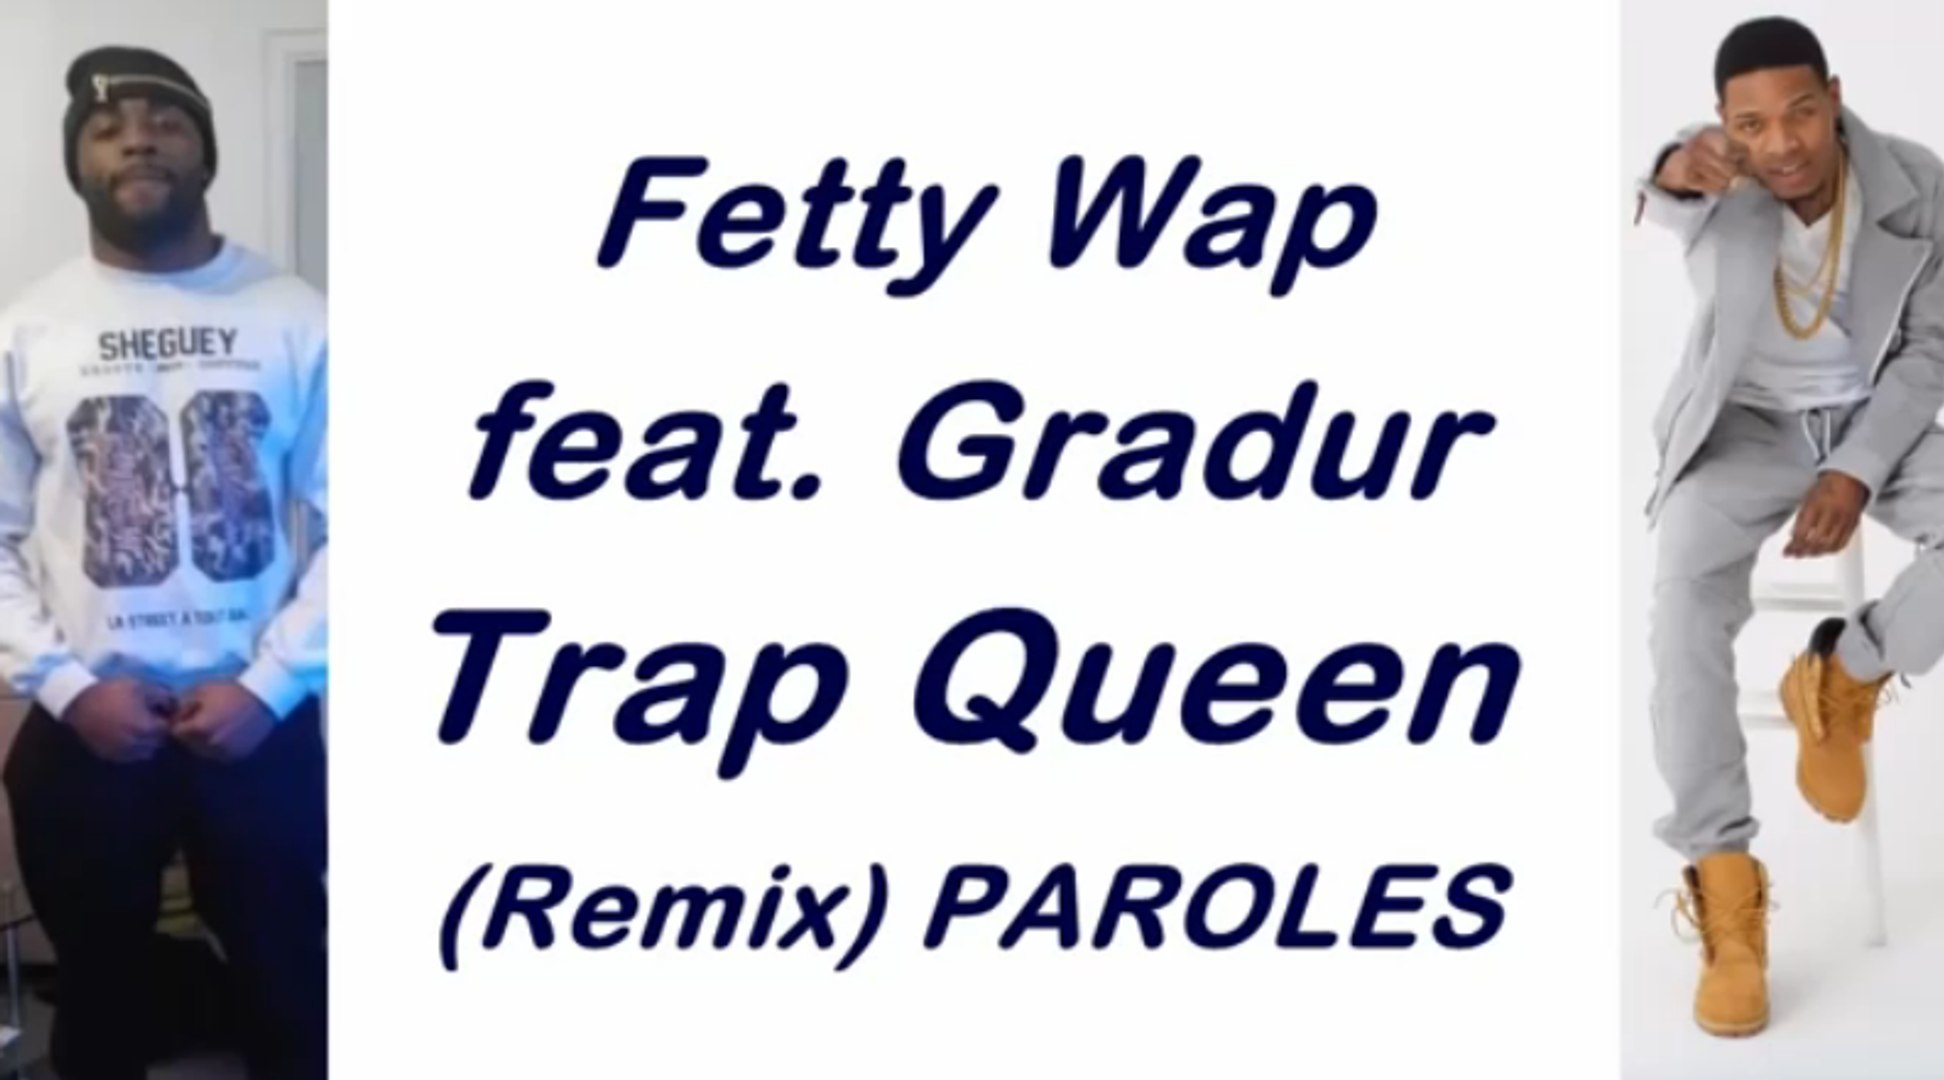 Fetty Wap feat  Gradur - Trap Queen (Remix) PAROLES